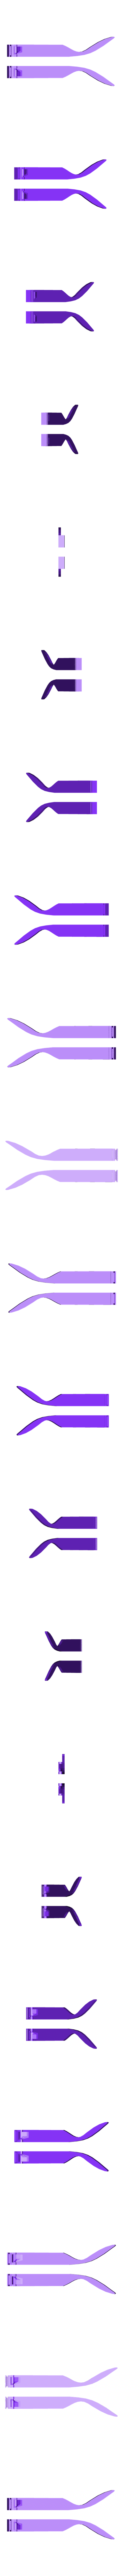 arms__2_.STL Download free STL file Lunettes 2015 • Model to 3D print, Makershop